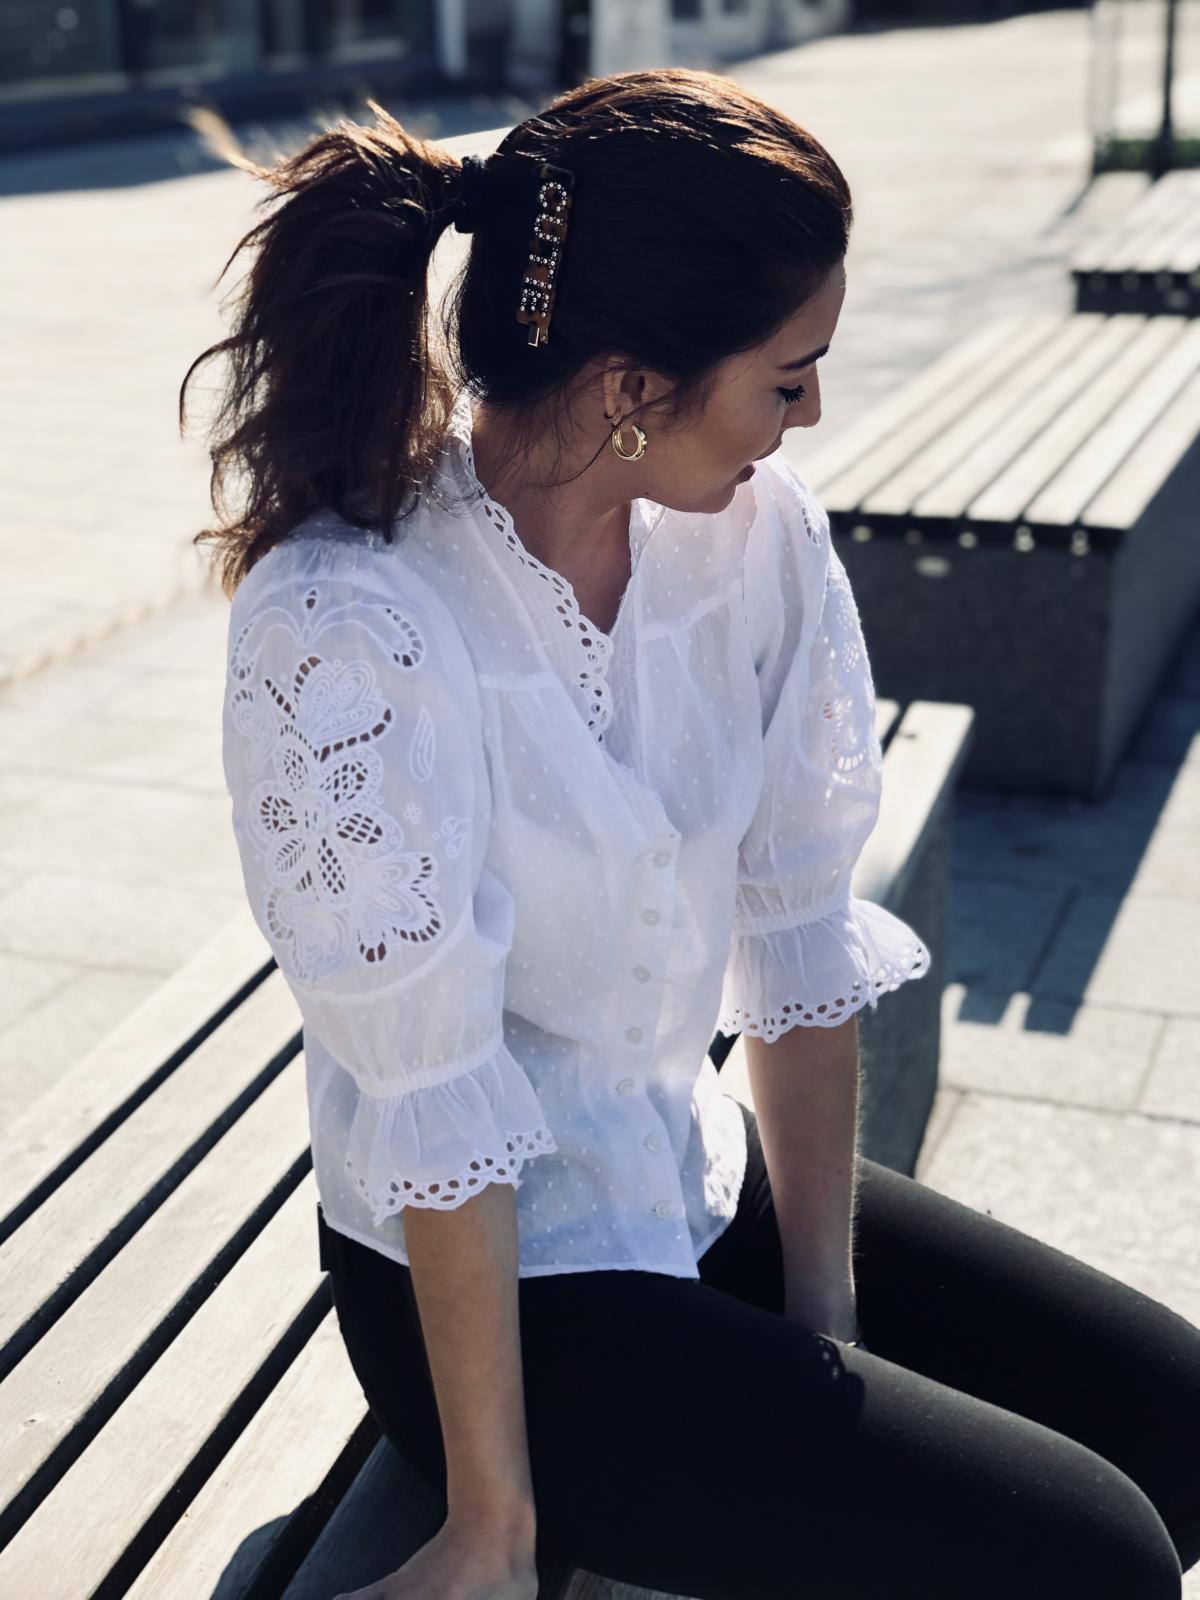 Bytimo Hvit Sunday Morning Shirt | Simply Fashion AS